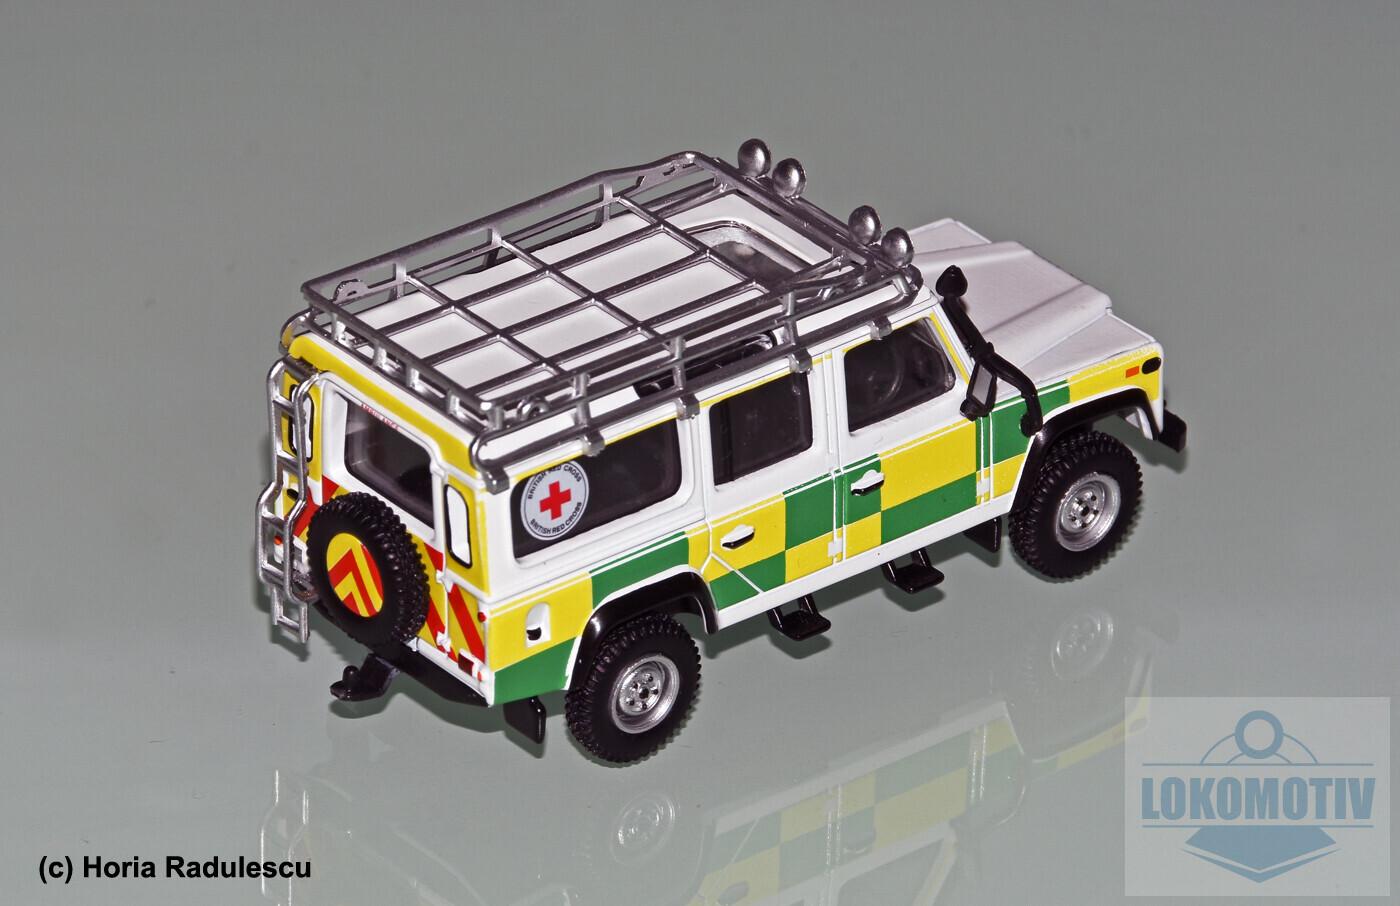 64-GB-Battenberg-Search-Rescue-Land-Rover-110-MiniGT-232c392ea934e3d53.jpg